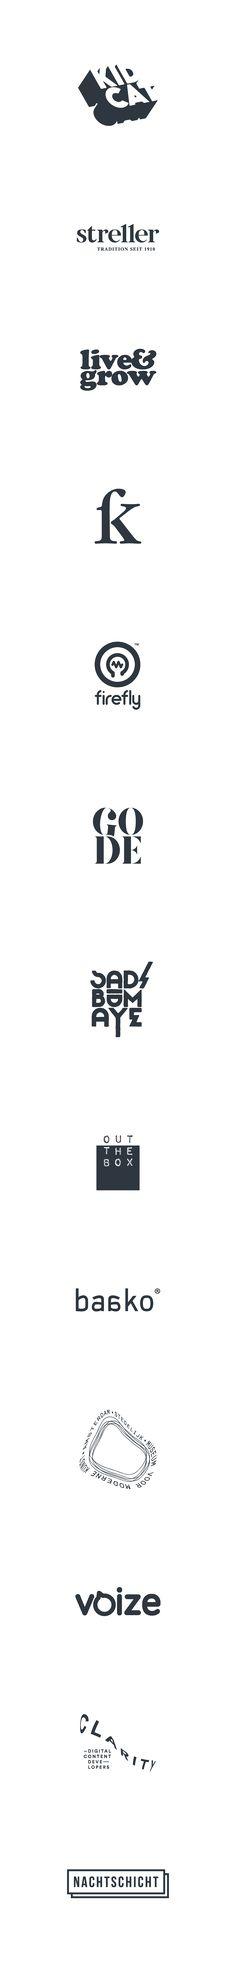 Logos 2014/2015 on Behance